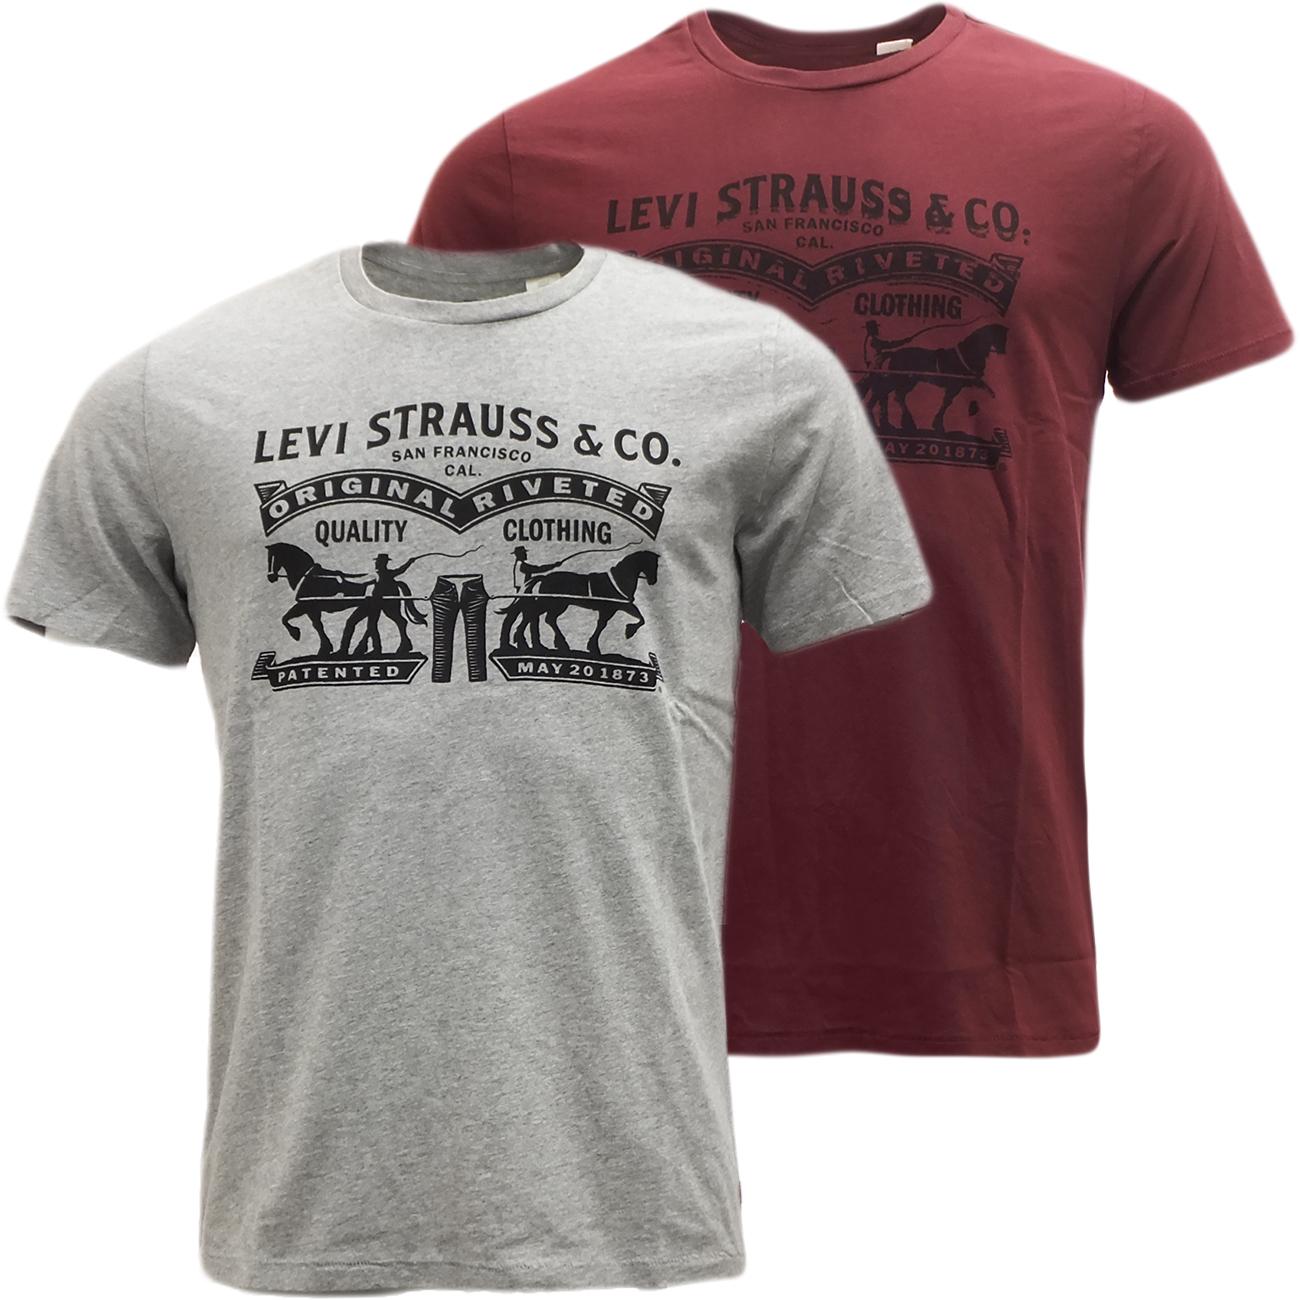 mens levi strauss t shirt original levis logo ebay. Black Bedroom Furniture Sets. Home Design Ideas